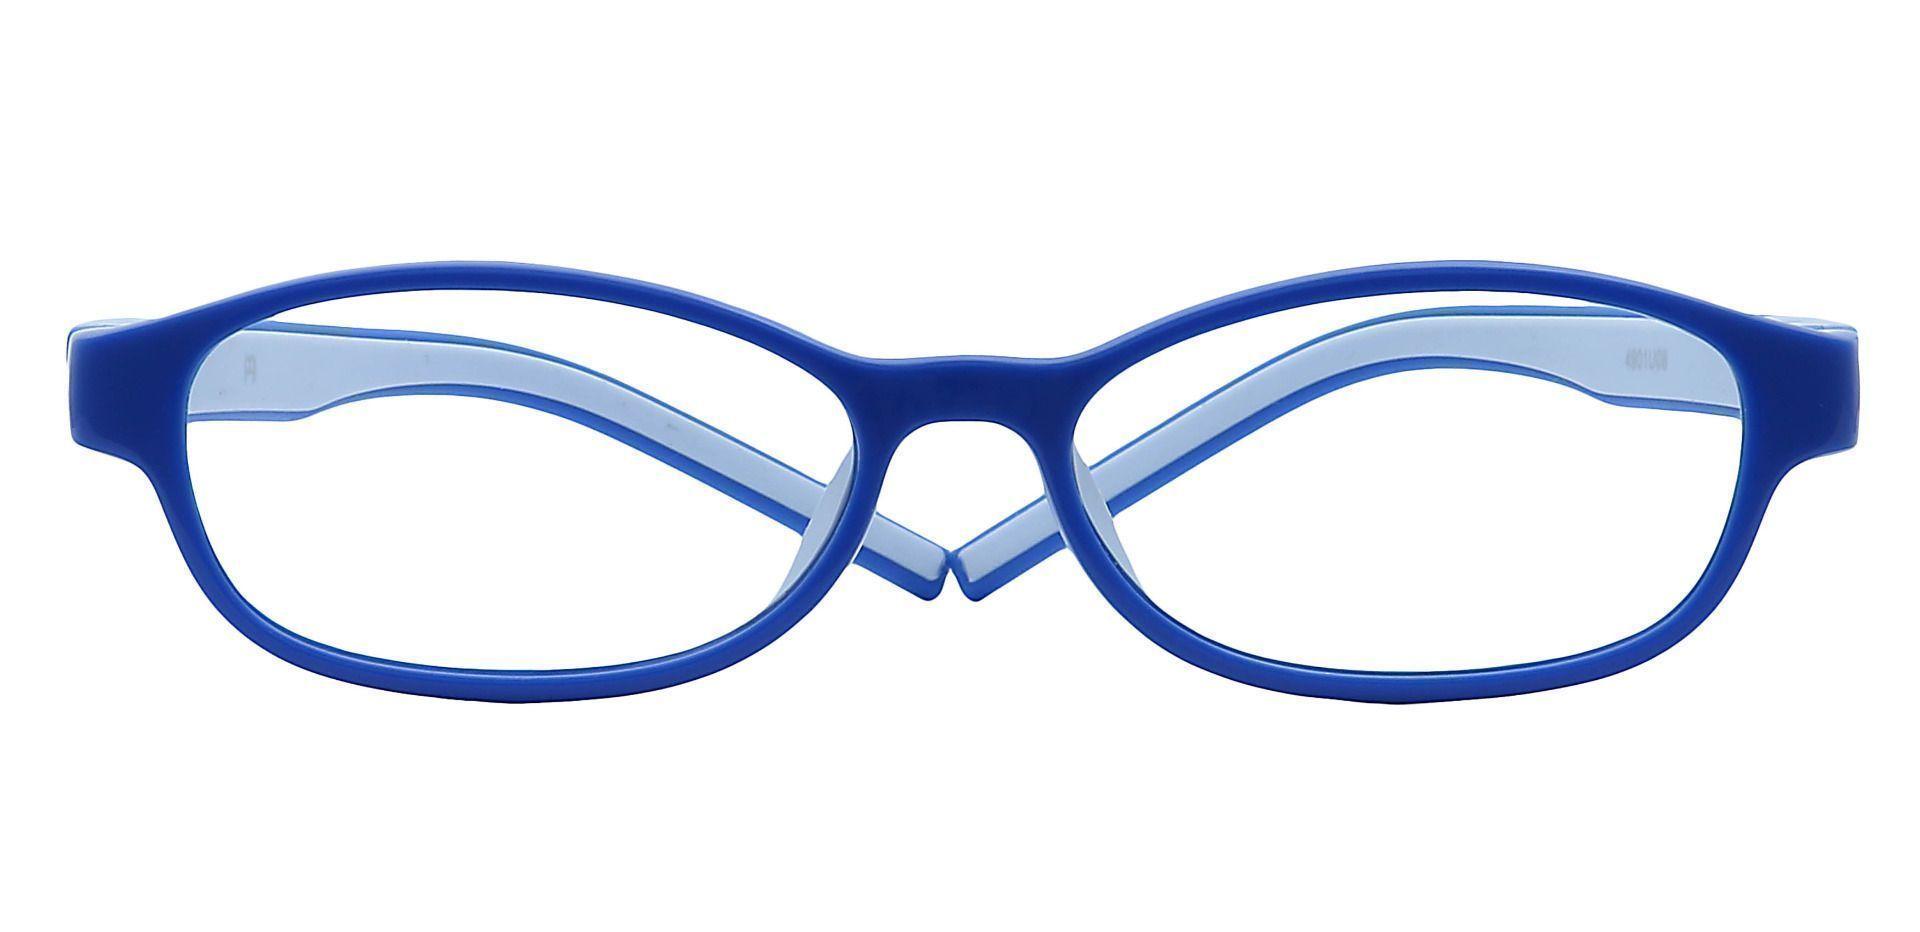 Moxie Oval Single Vision Glasses - Blue